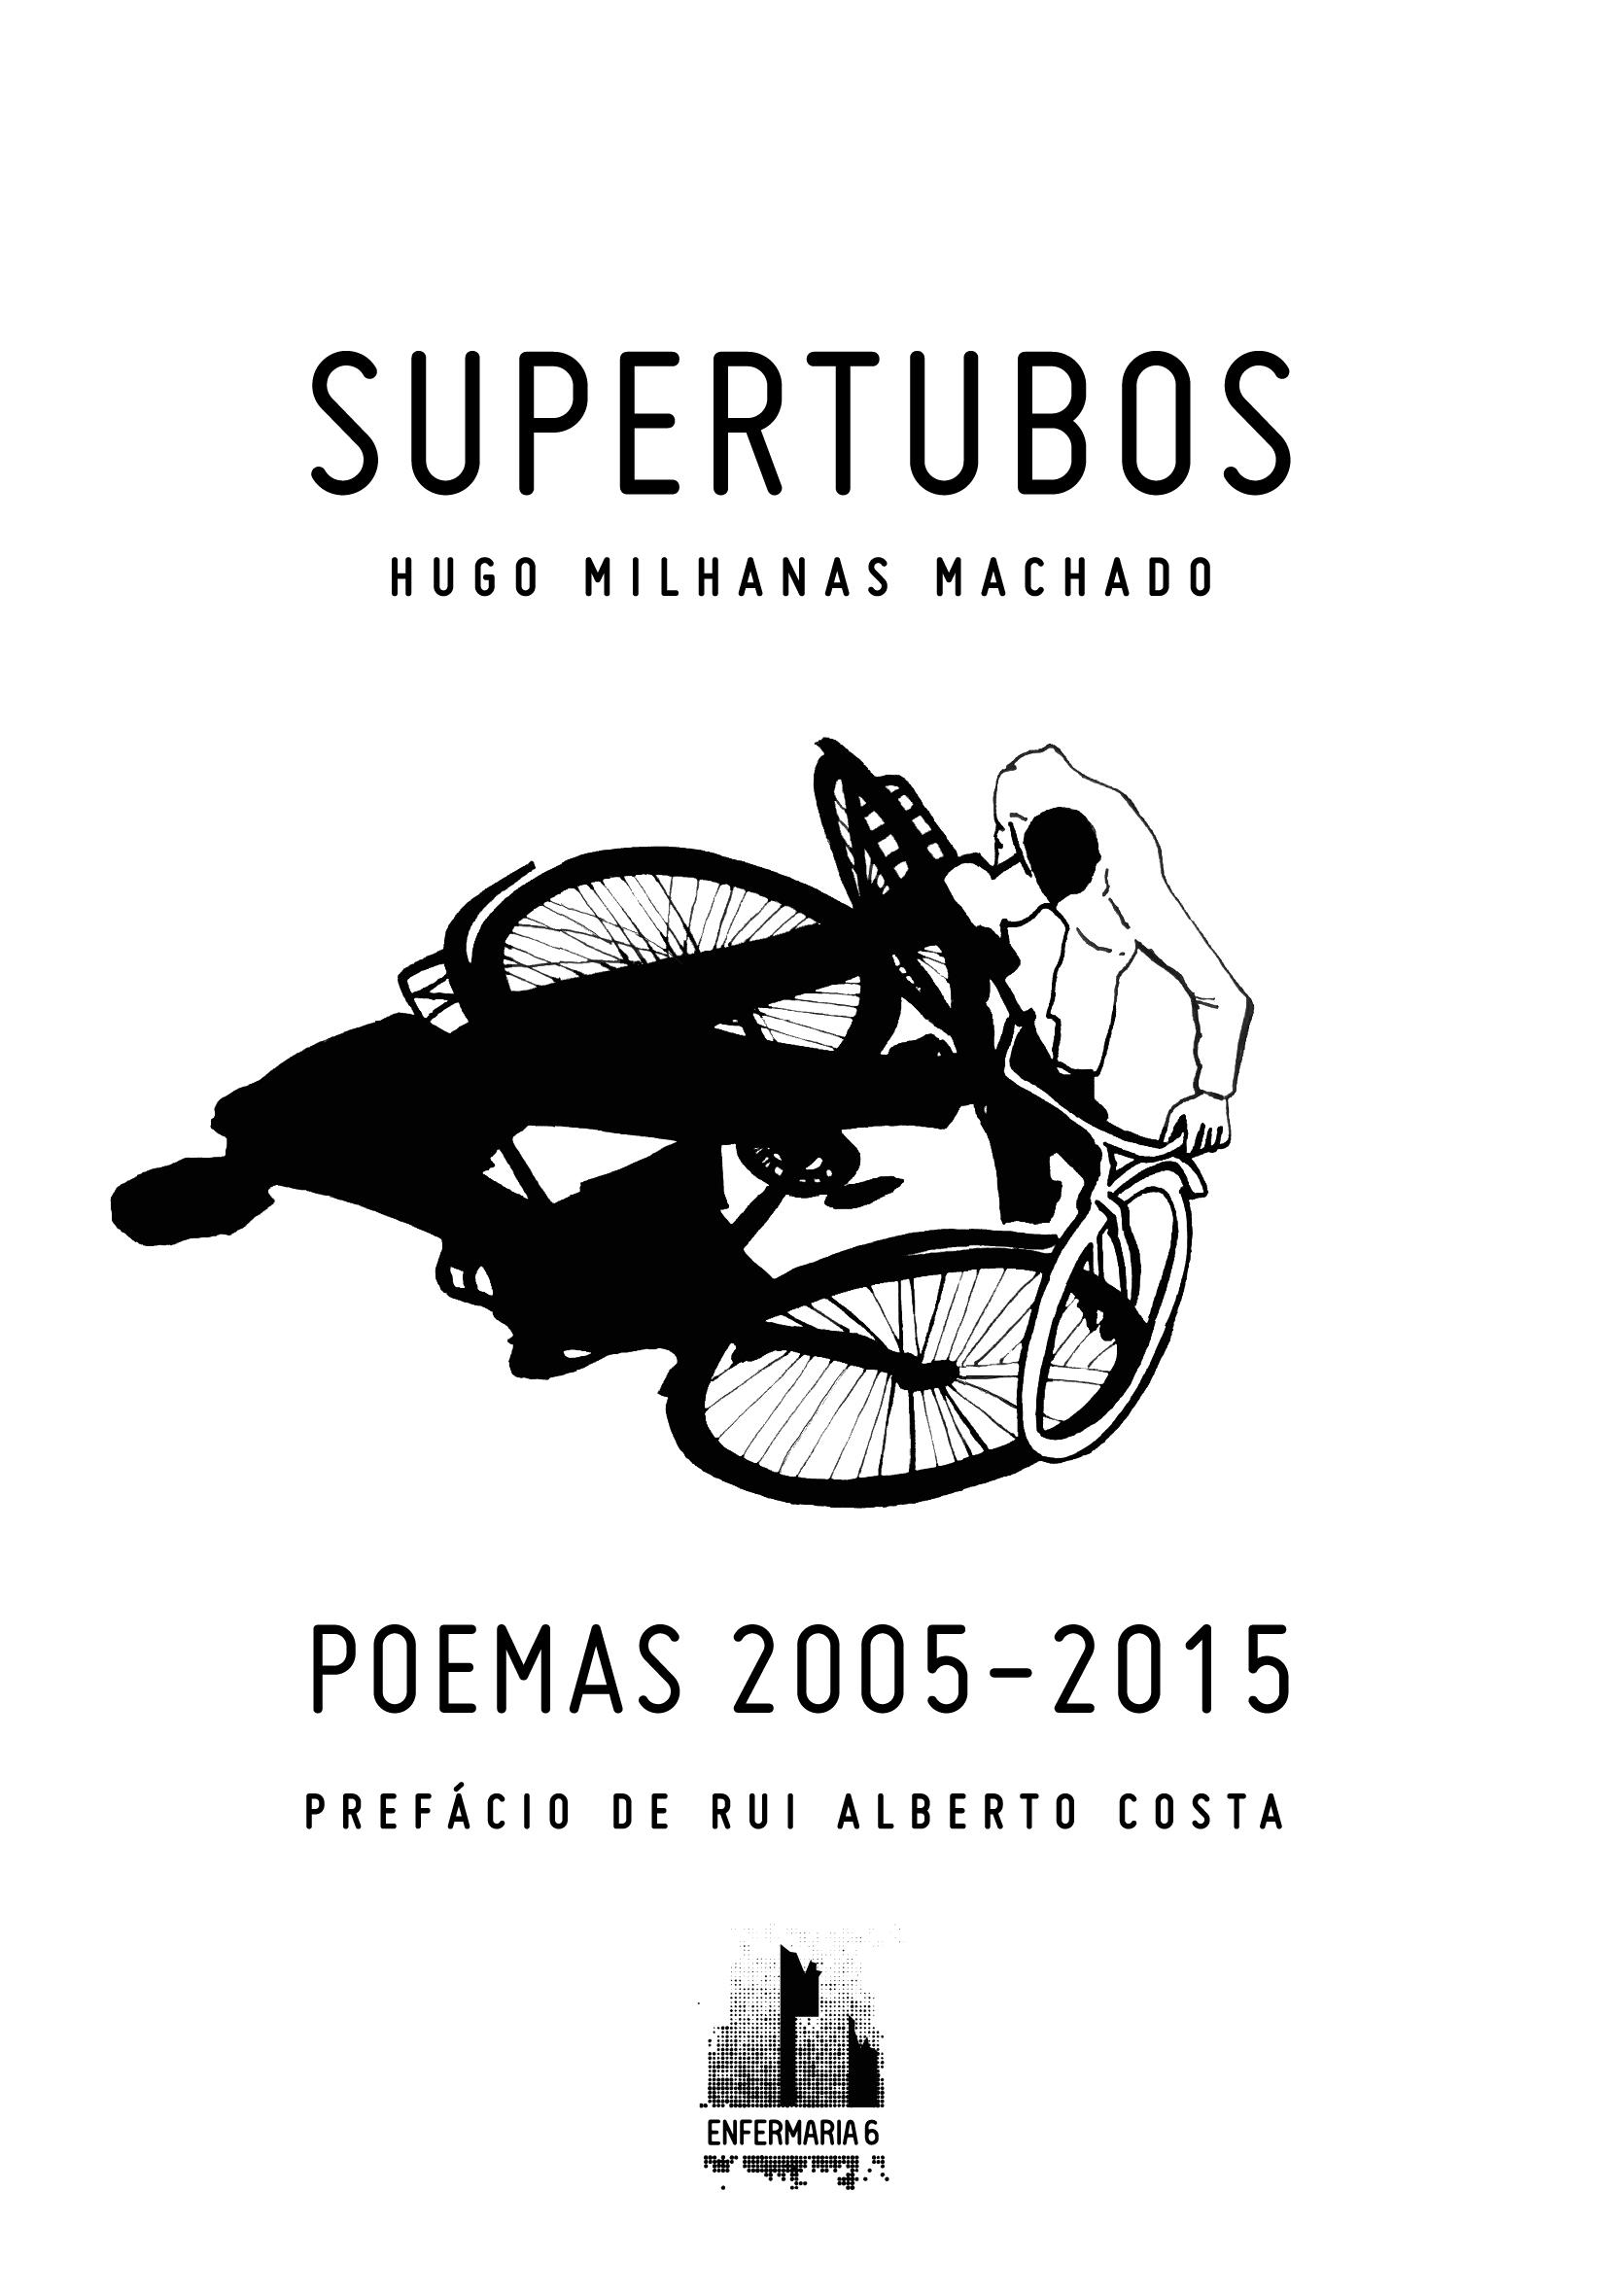 supertubos_capa_final-07.jpg